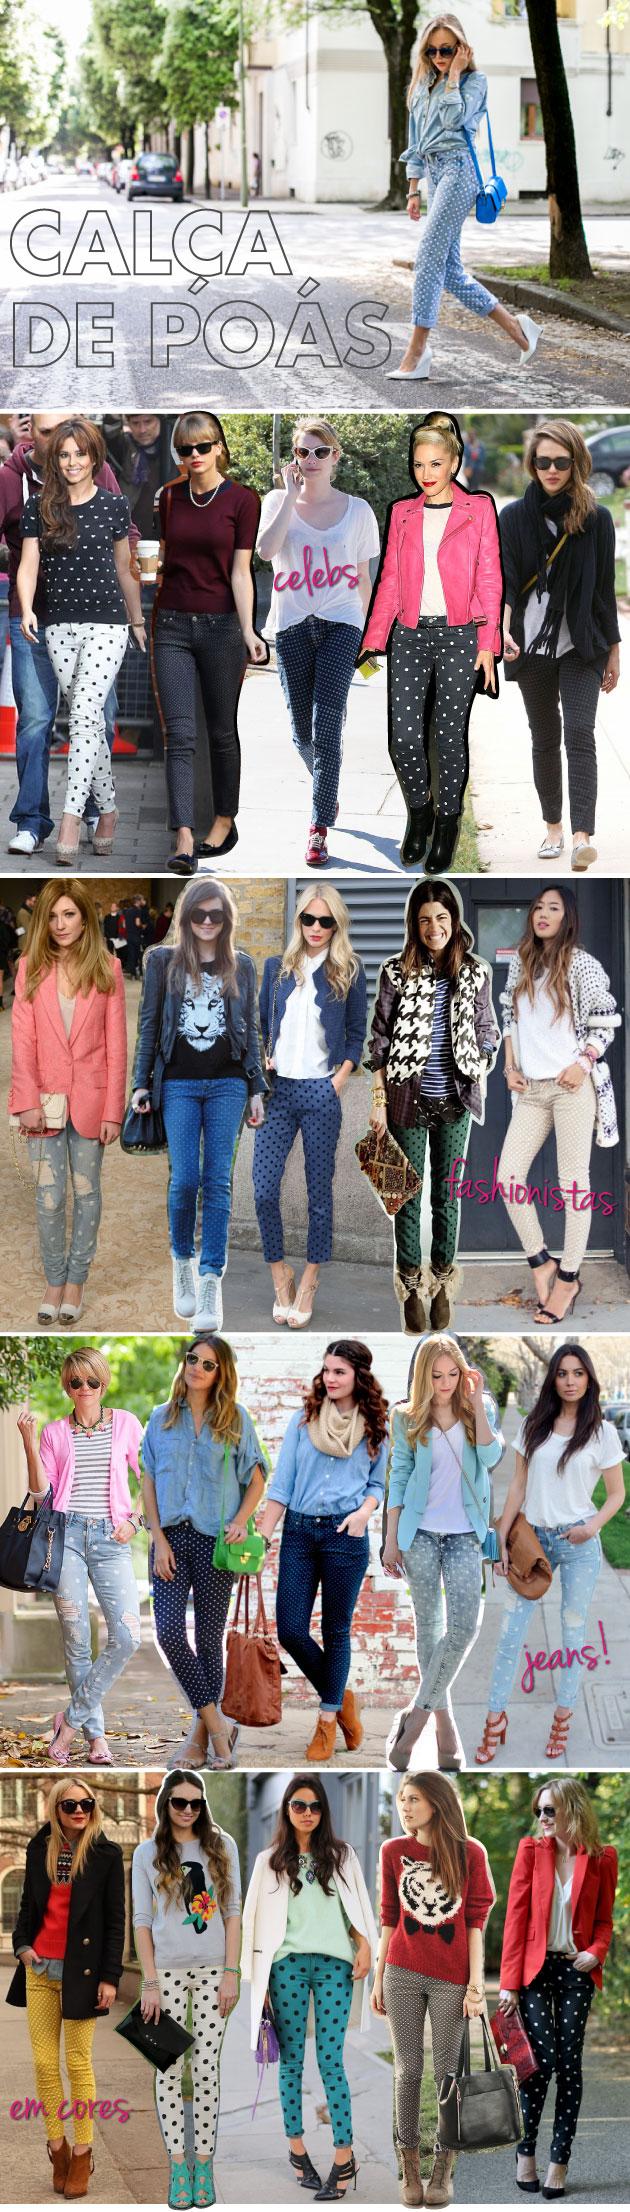 tendencia-calca-de-poas-jeans-polka-dot-pants-trend-pois-pontilhado-calca-jeans-fashionista-famosas-onde-encontrar-compras-como-usar-looks-ideias-producoes-outfits